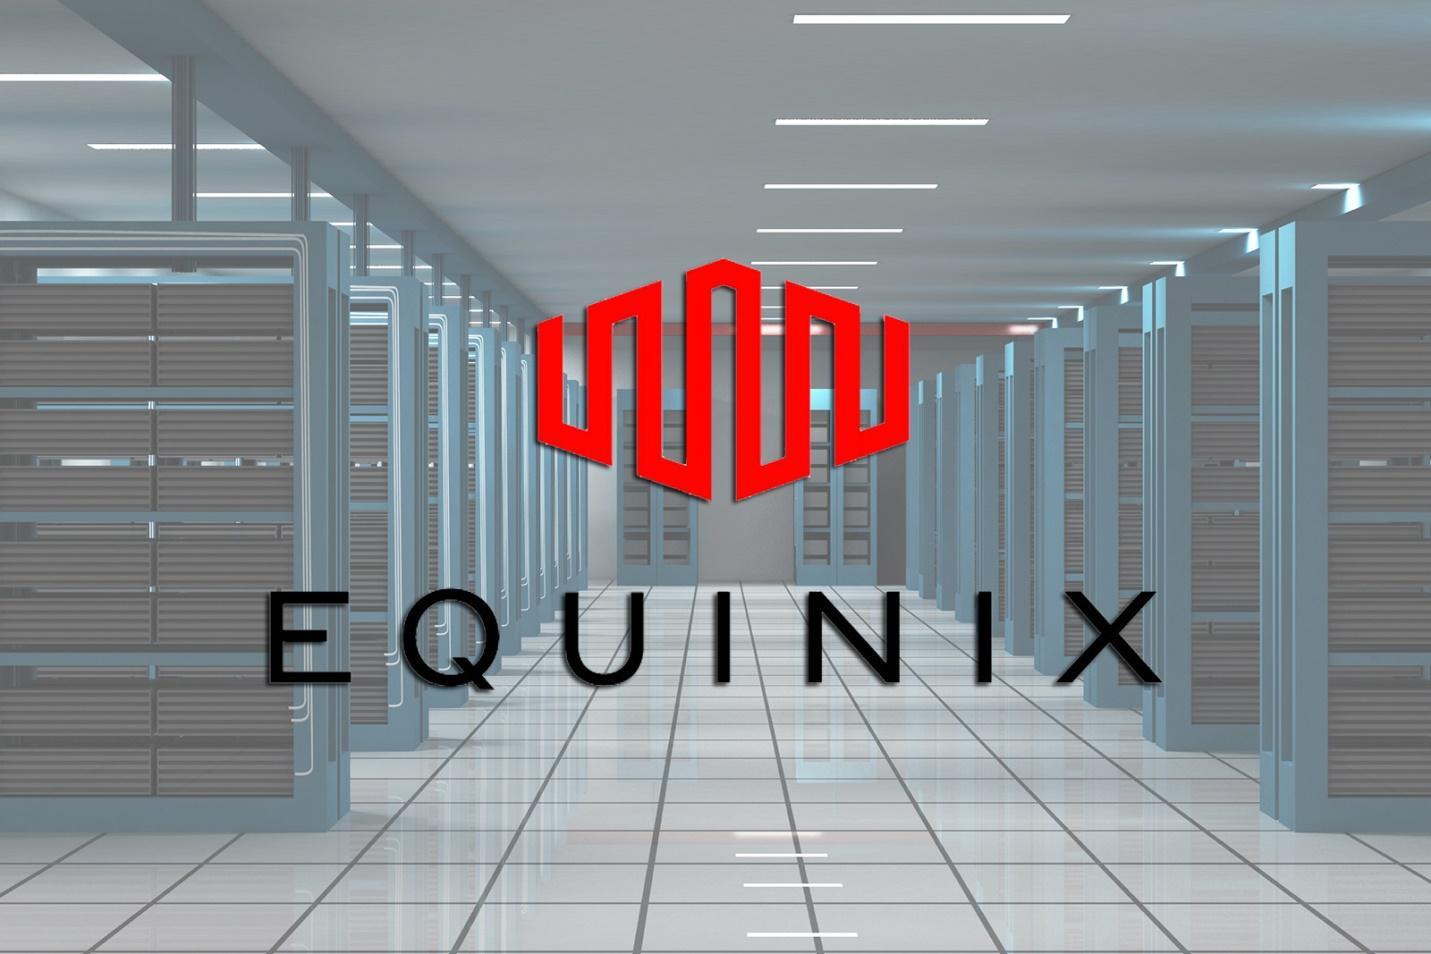 Дата-центр за рубежом: Equinix LD8 - 8